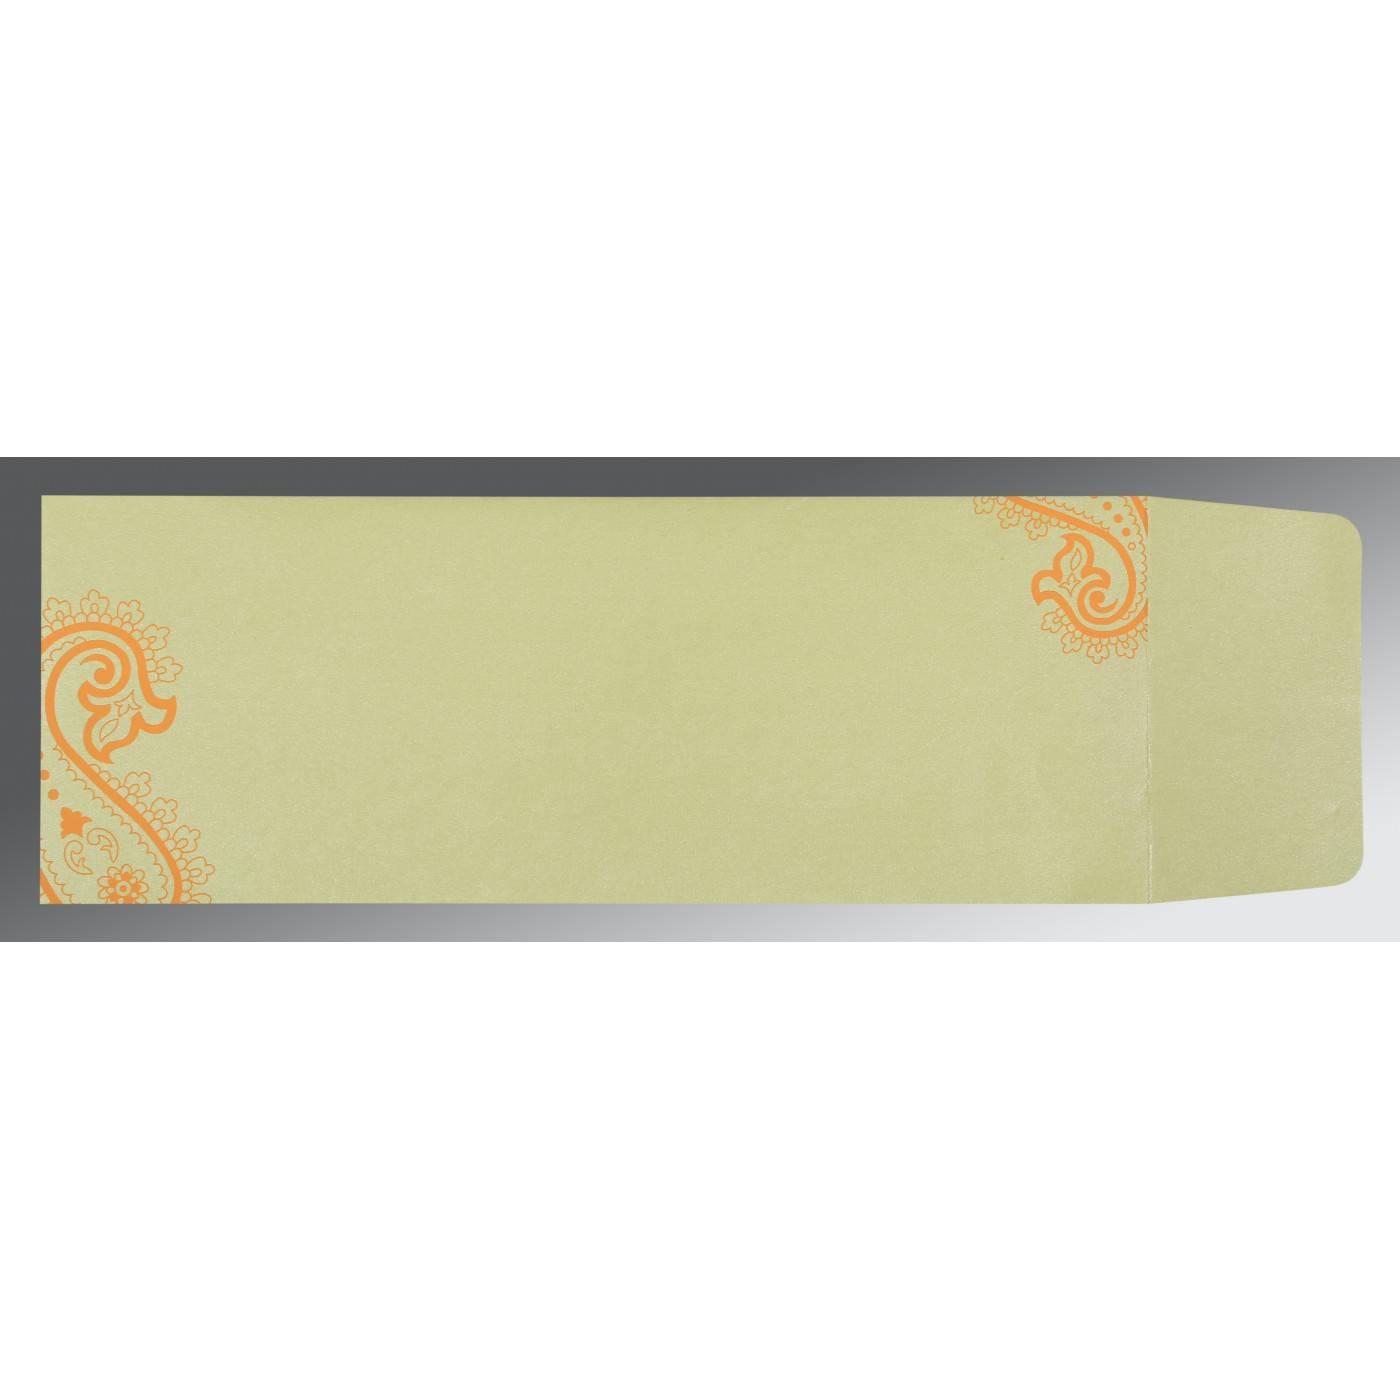 LIGHT ORANGE WOOLY FOIL STAMPED WEDDING CARD : CSC-5015J - IndianWeddingCards